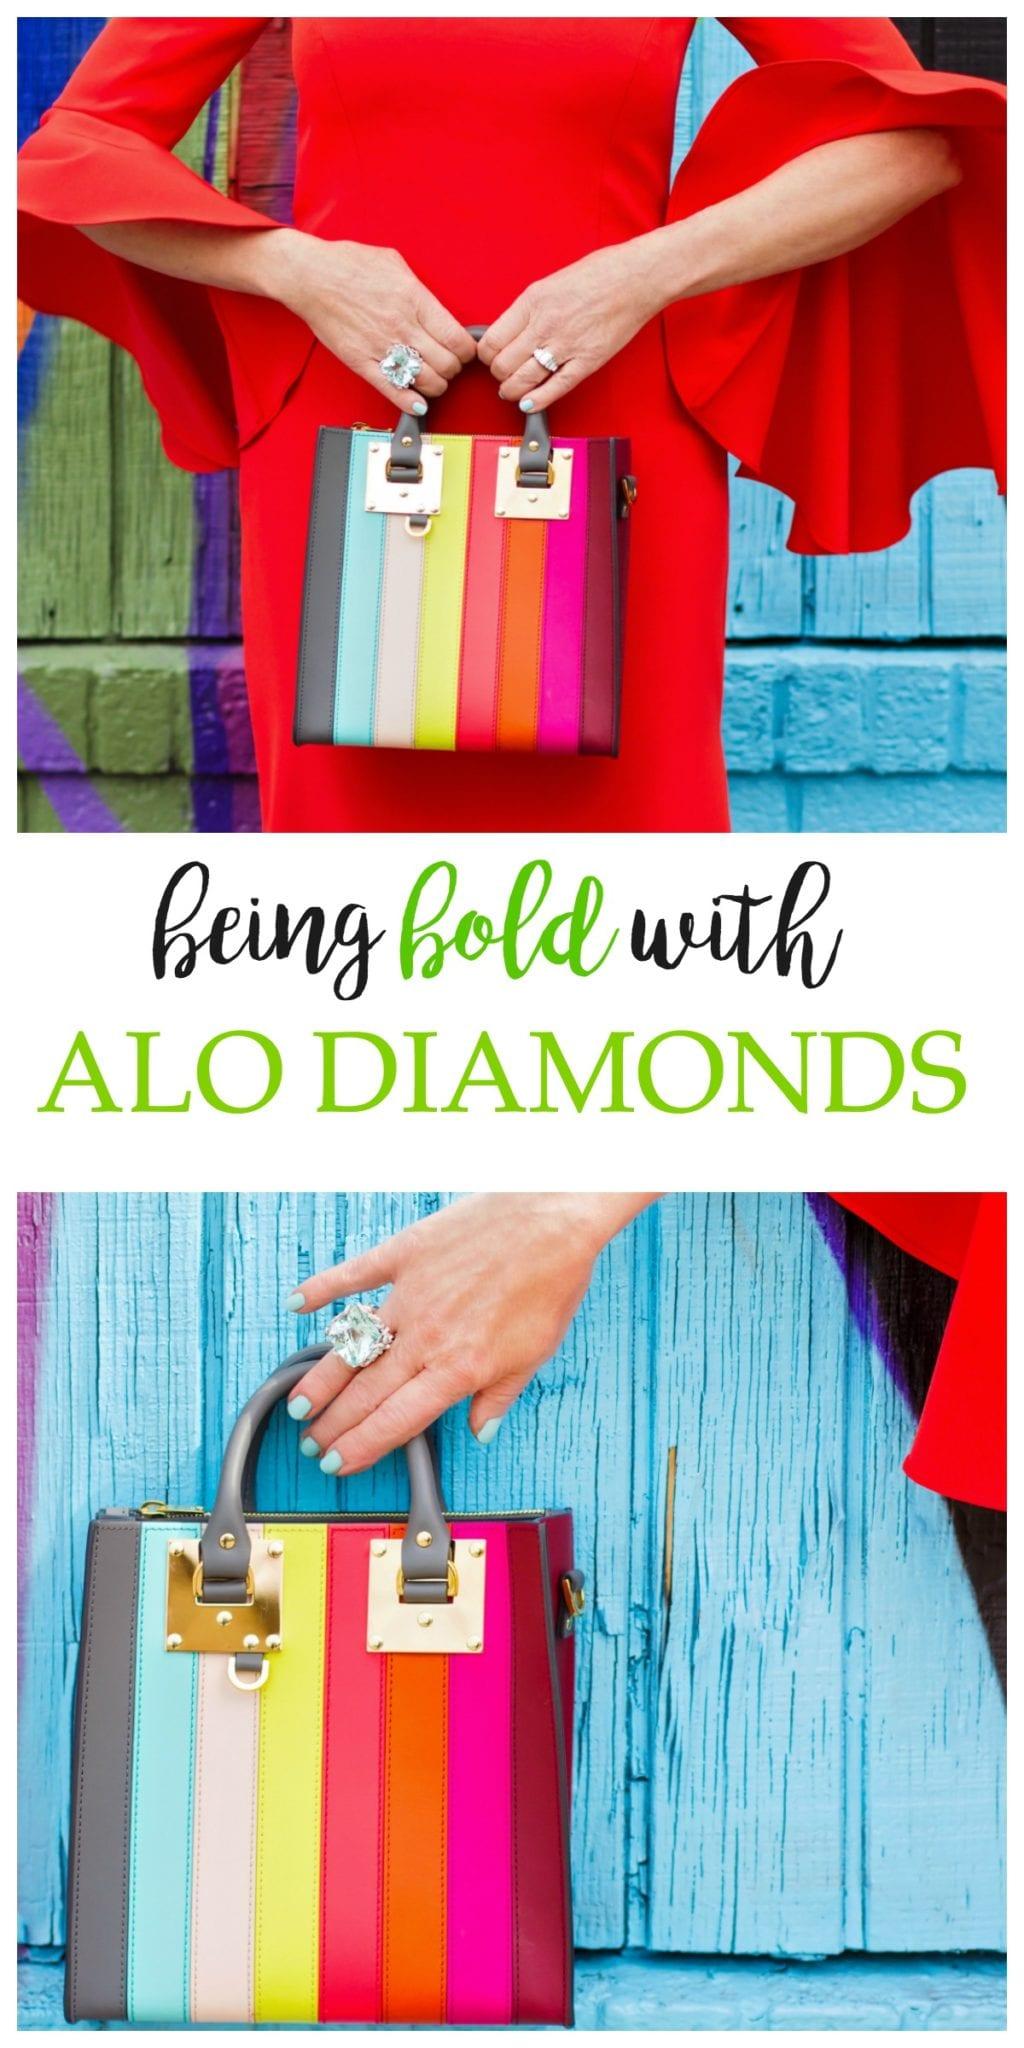 "beingboldalodiamonds"""""